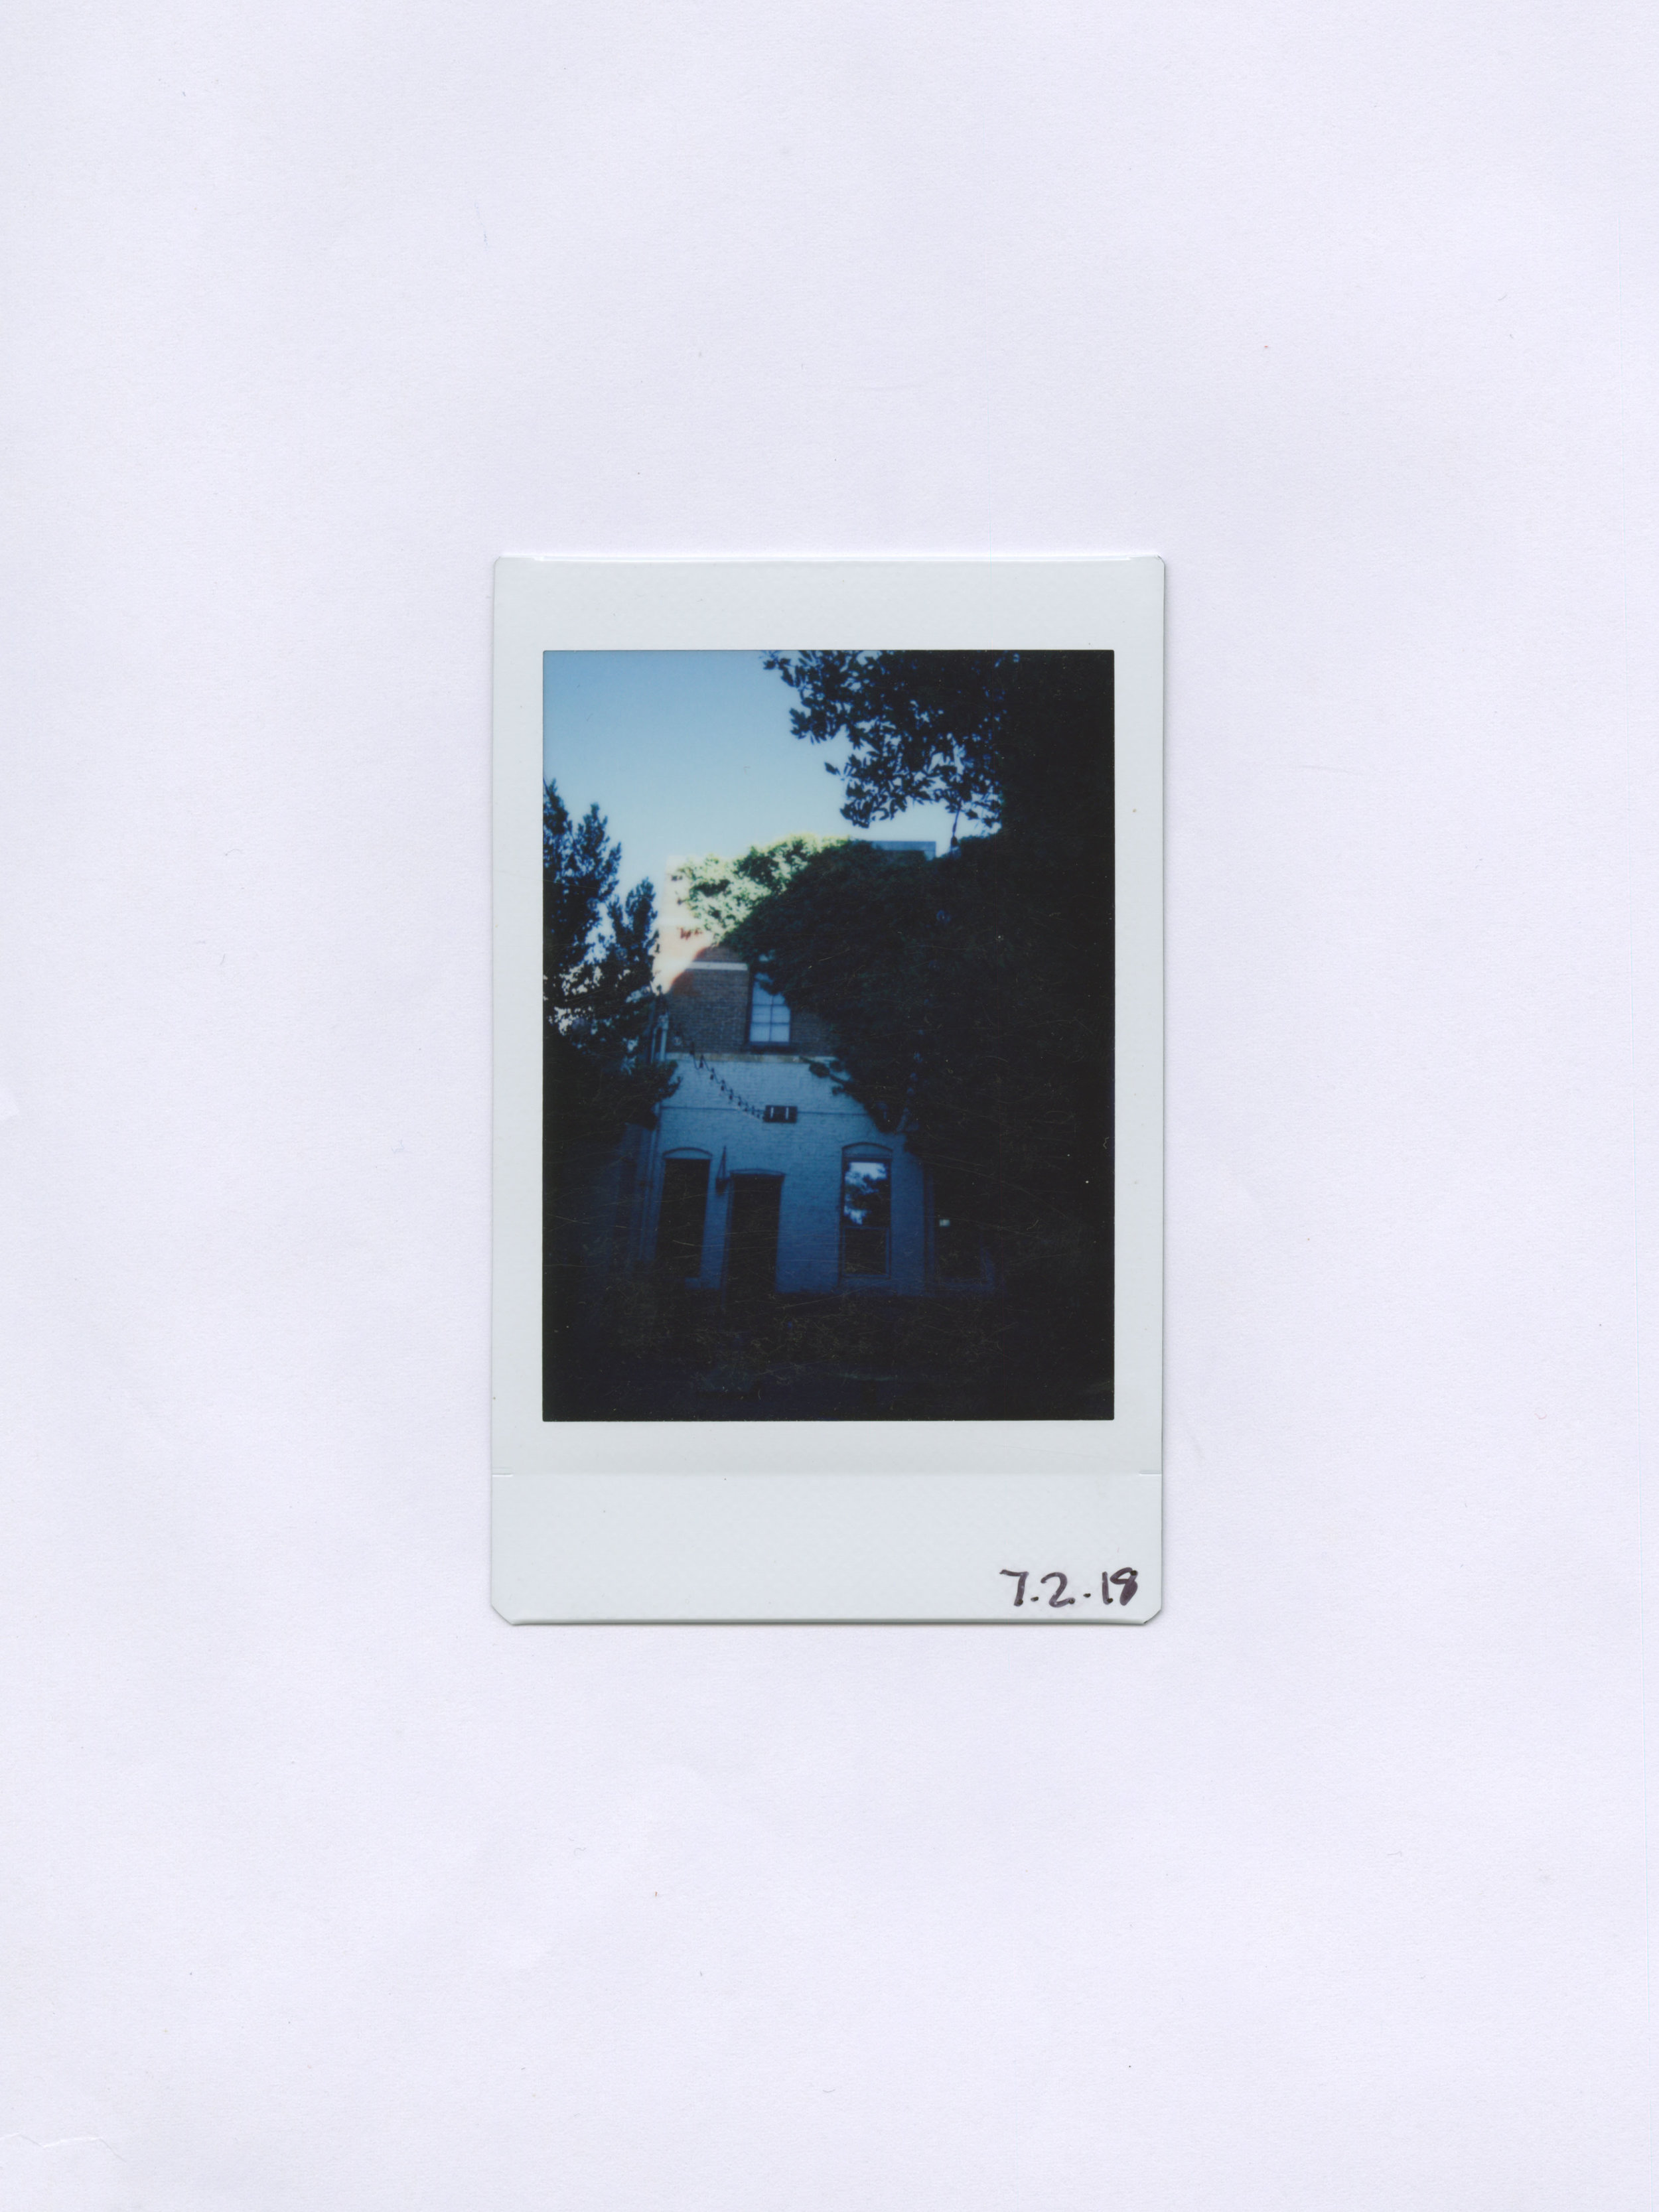 7.2.18A.jpg